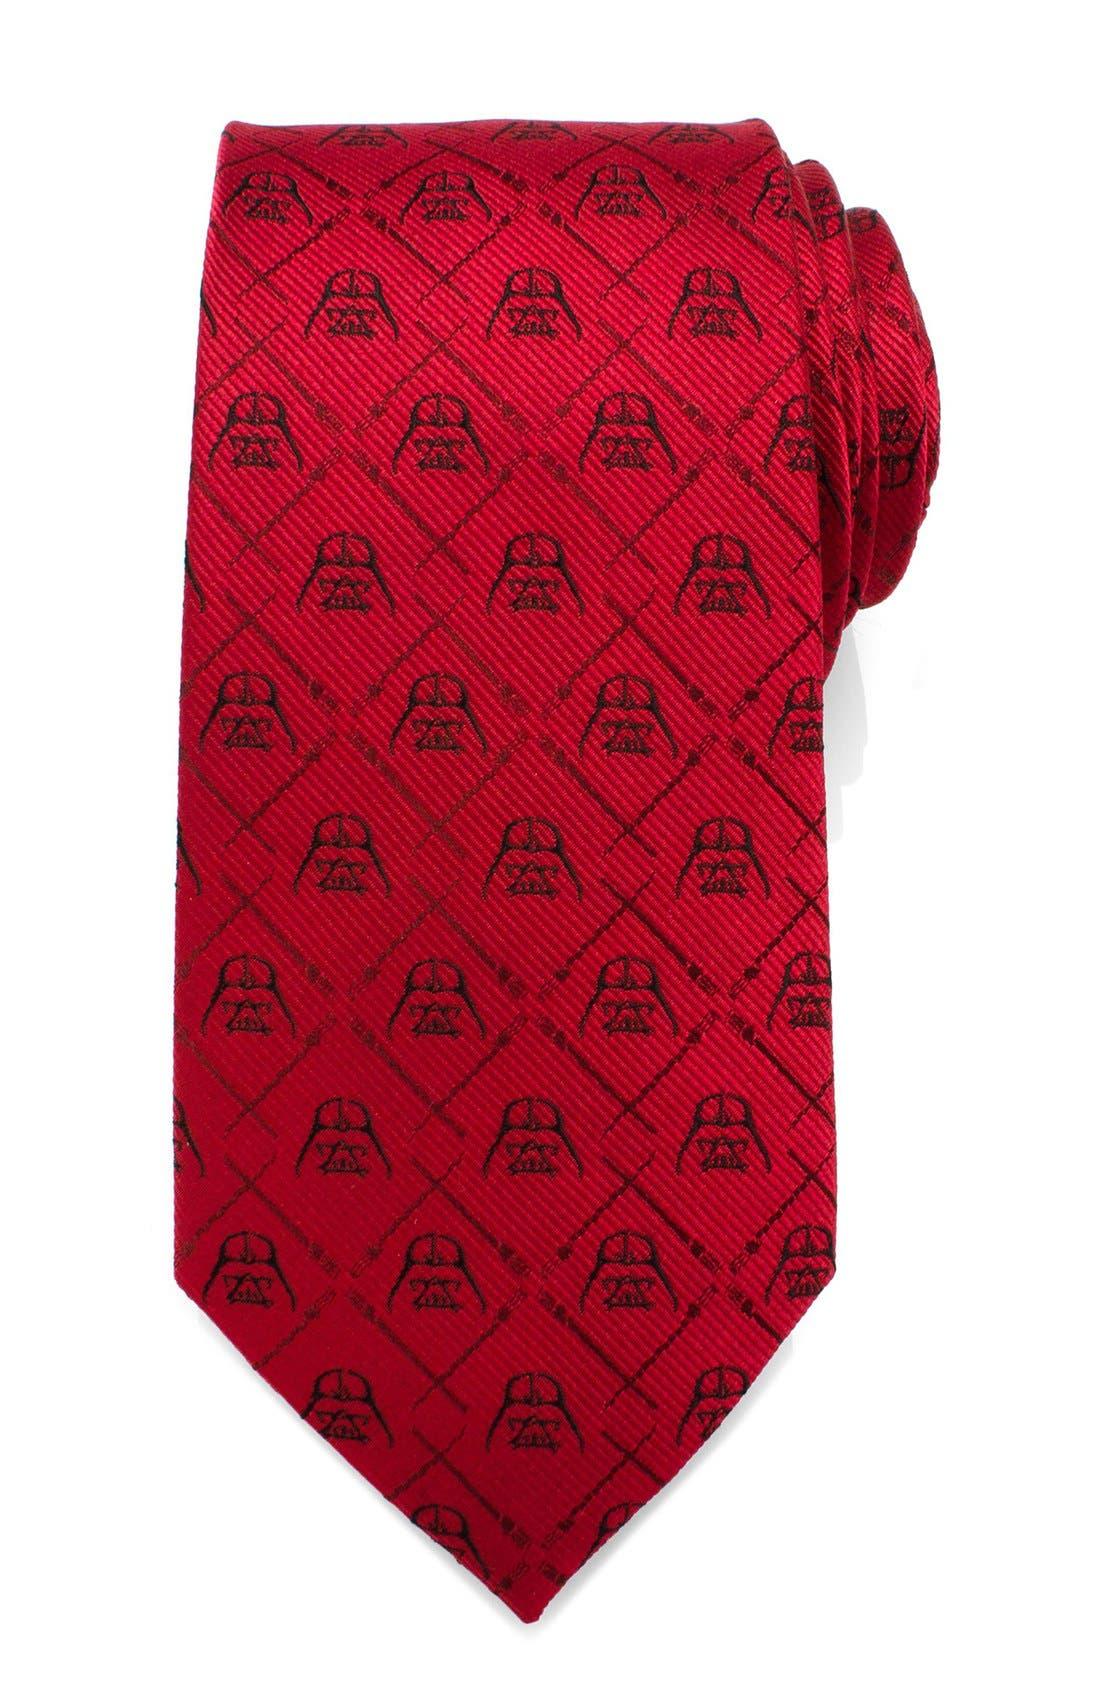 Alternate Image 1 Selected - Cufflinks, Inc. 'Darth Vader' Silk Tie